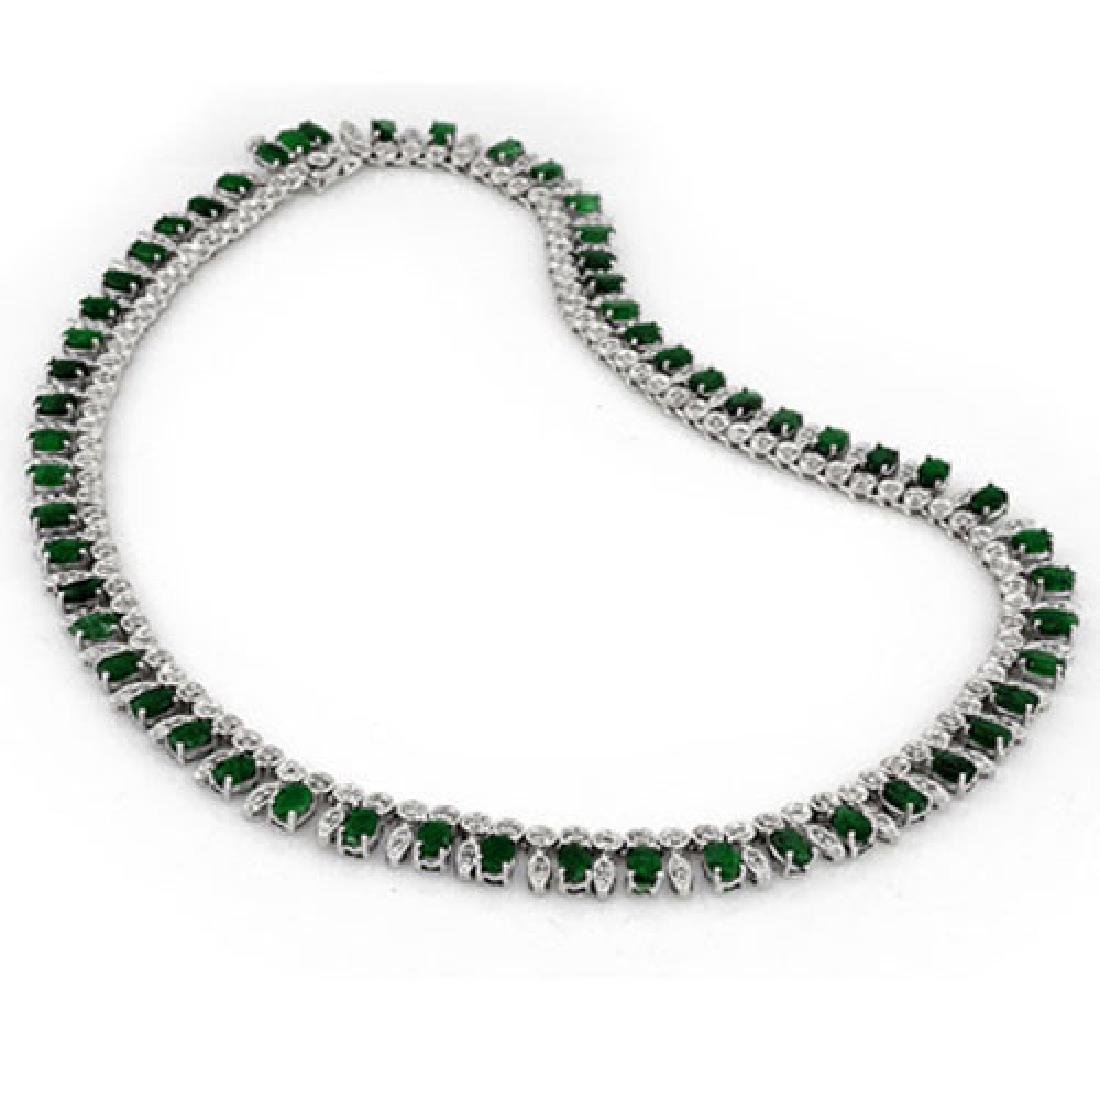 26 CTW Emerald & Diamond Necklace 14K White Gold